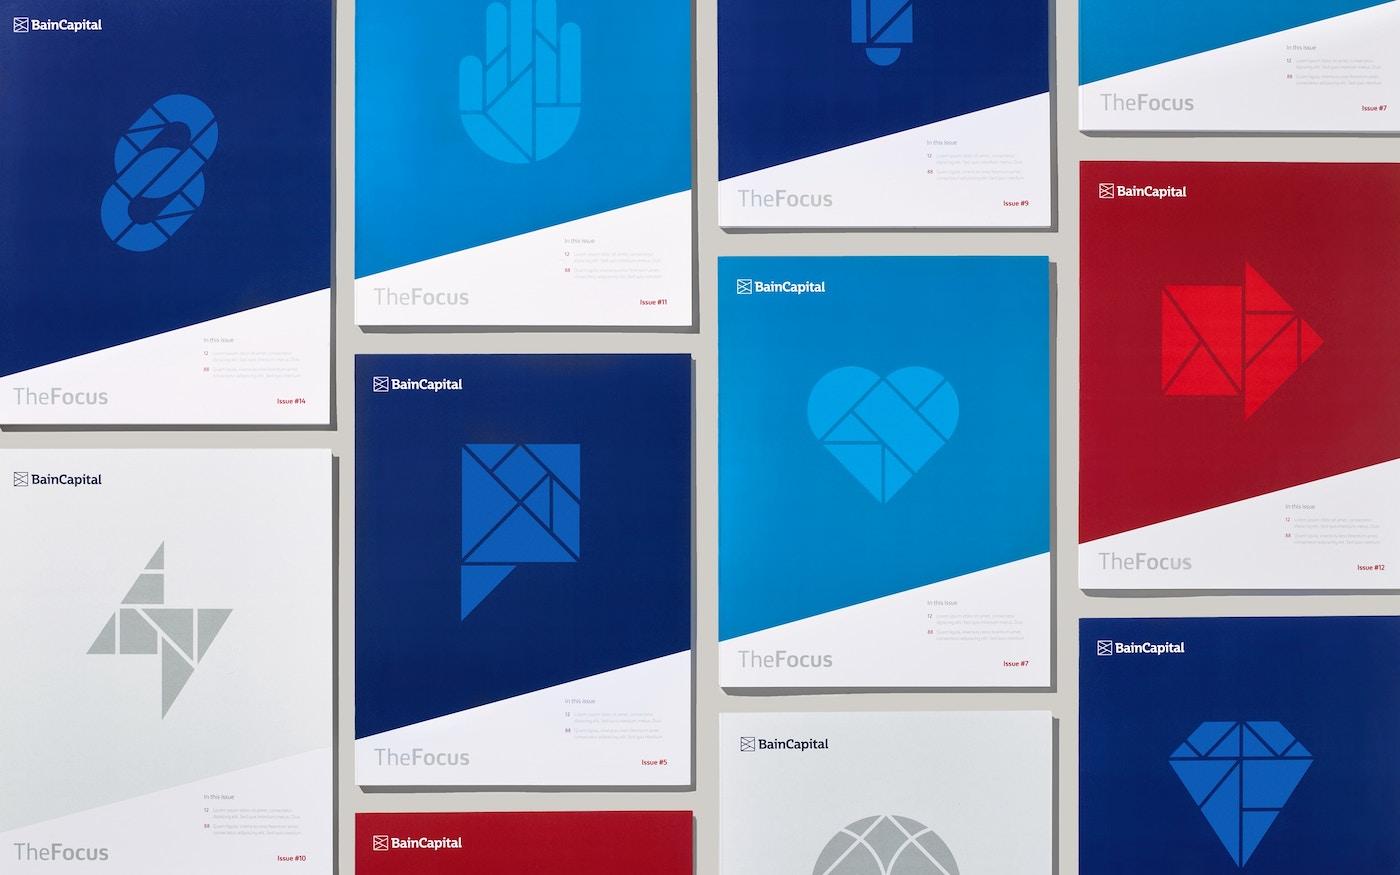 Bain Capital printed materials